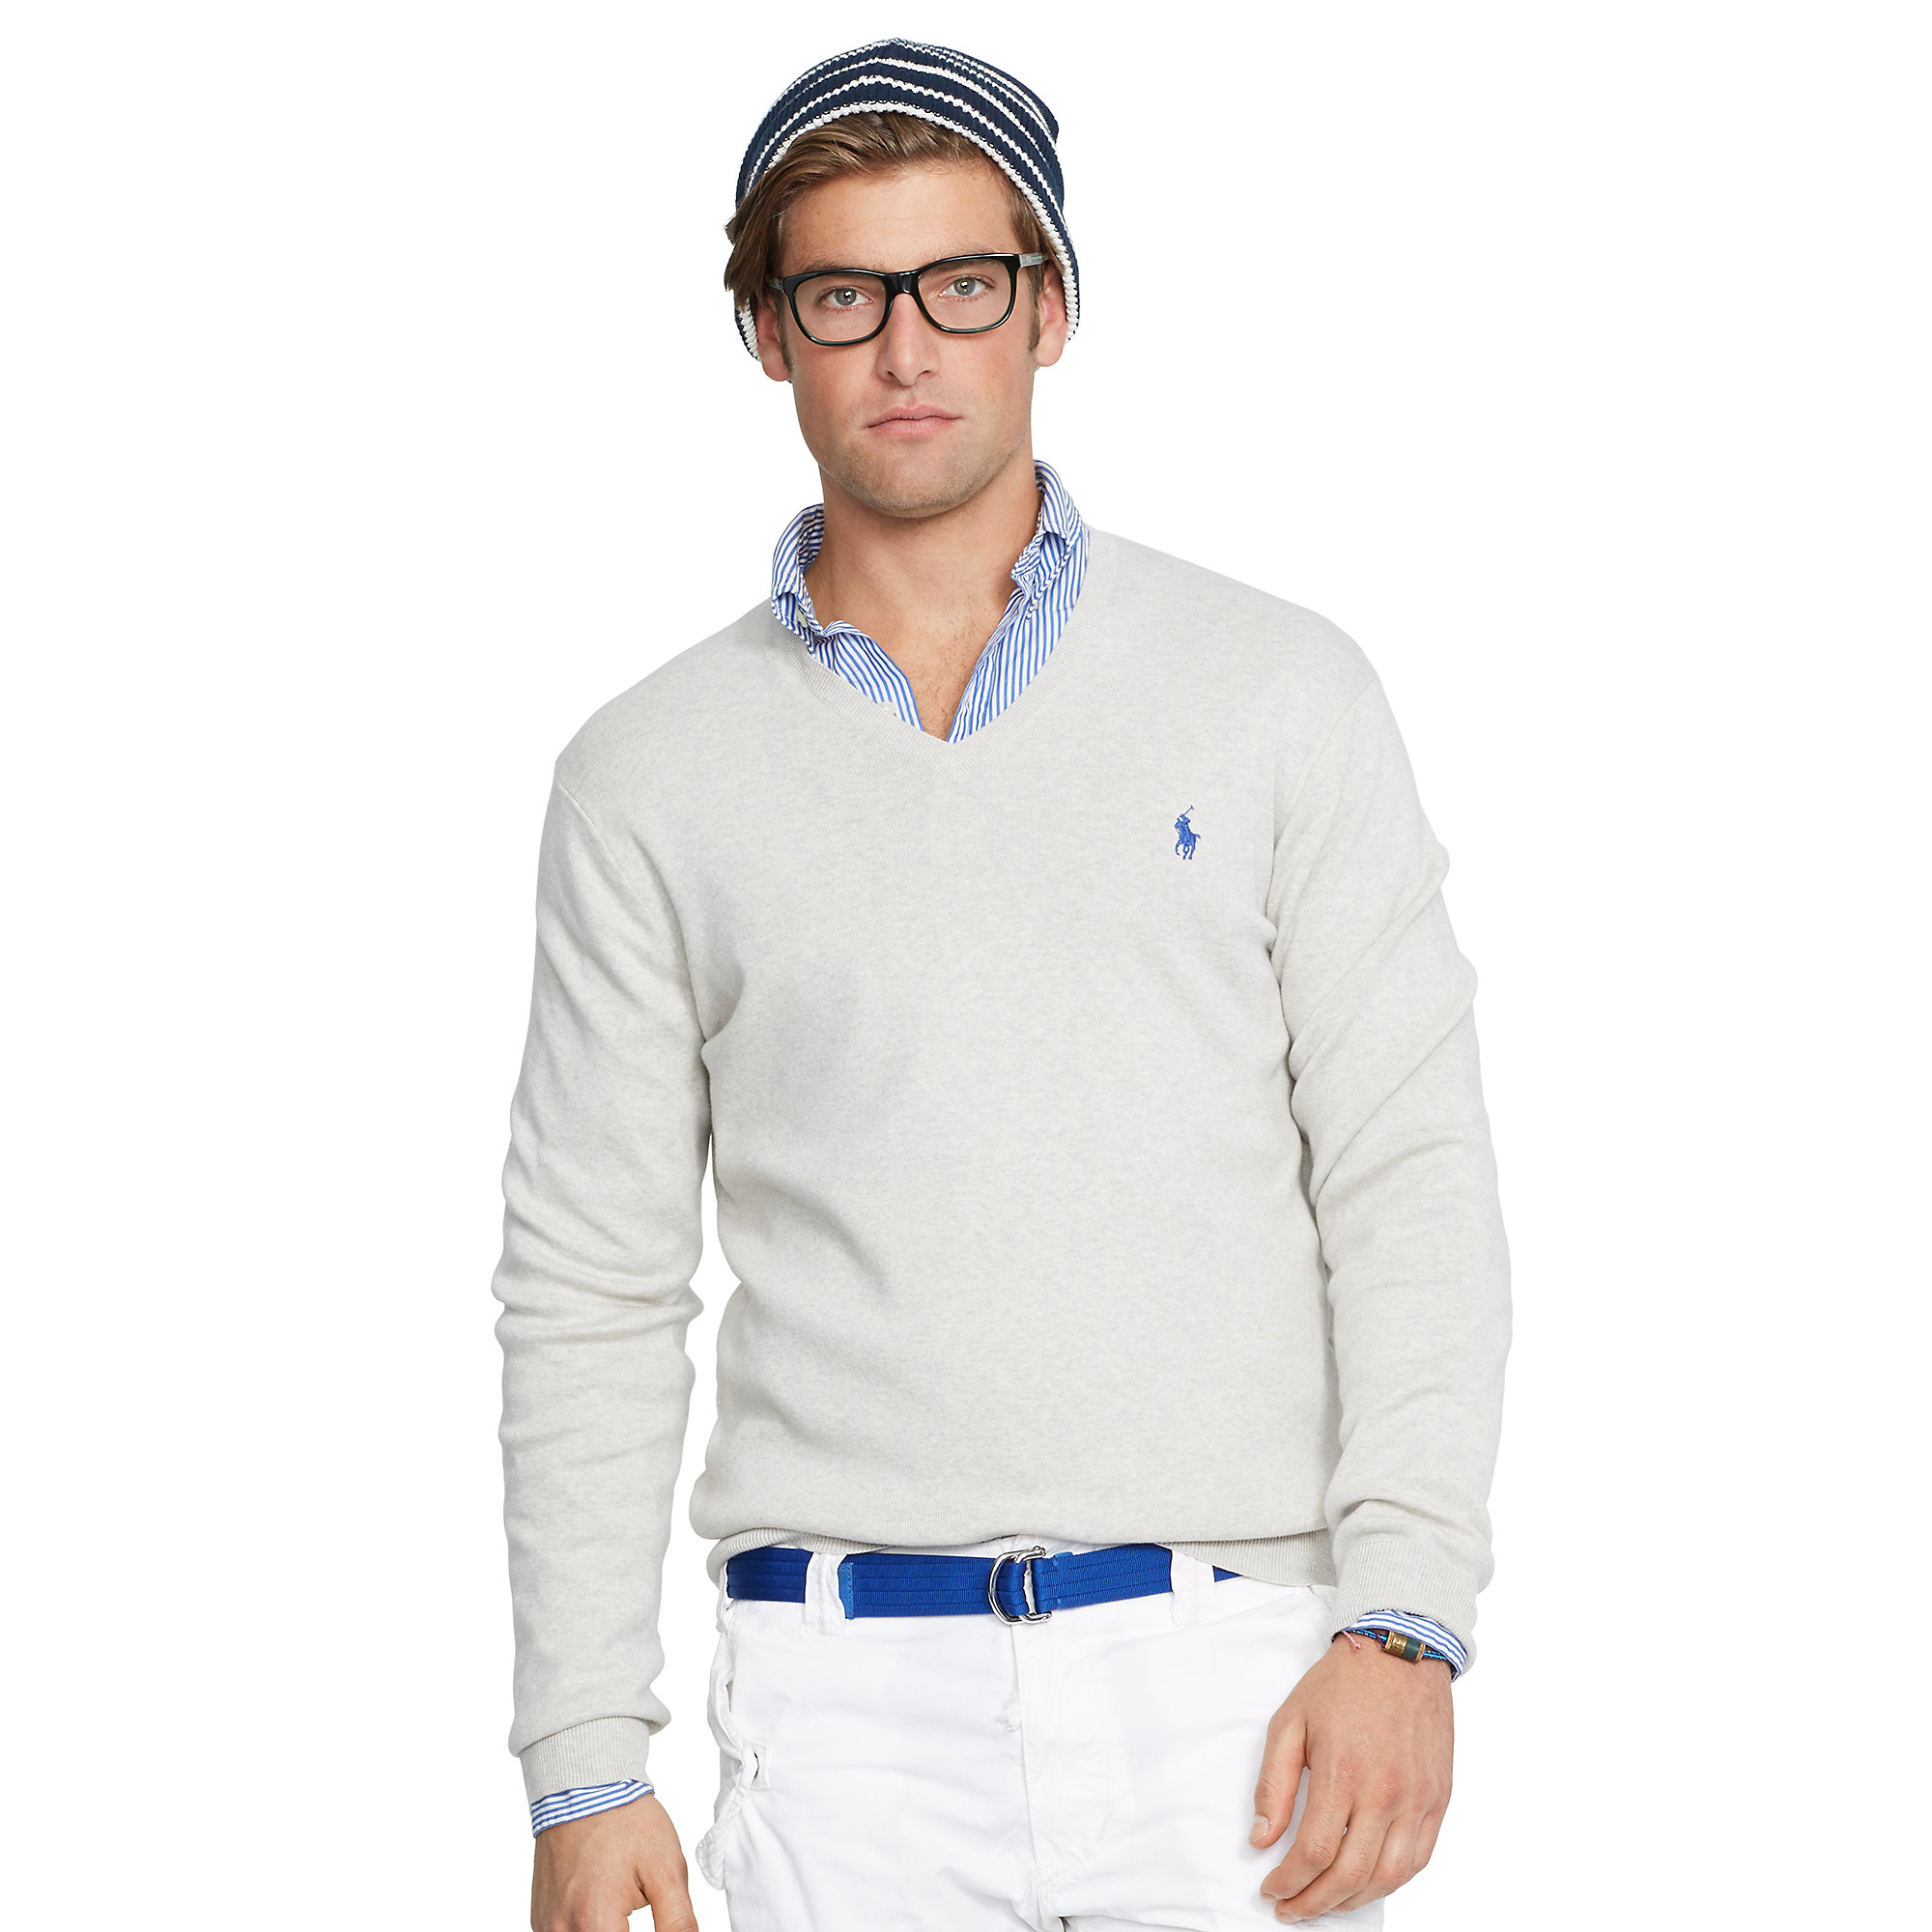 polo ralph lauren pima cotton v neck sweater in gray for men lyst. Black Bedroom Furniture Sets. Home Design Ideas